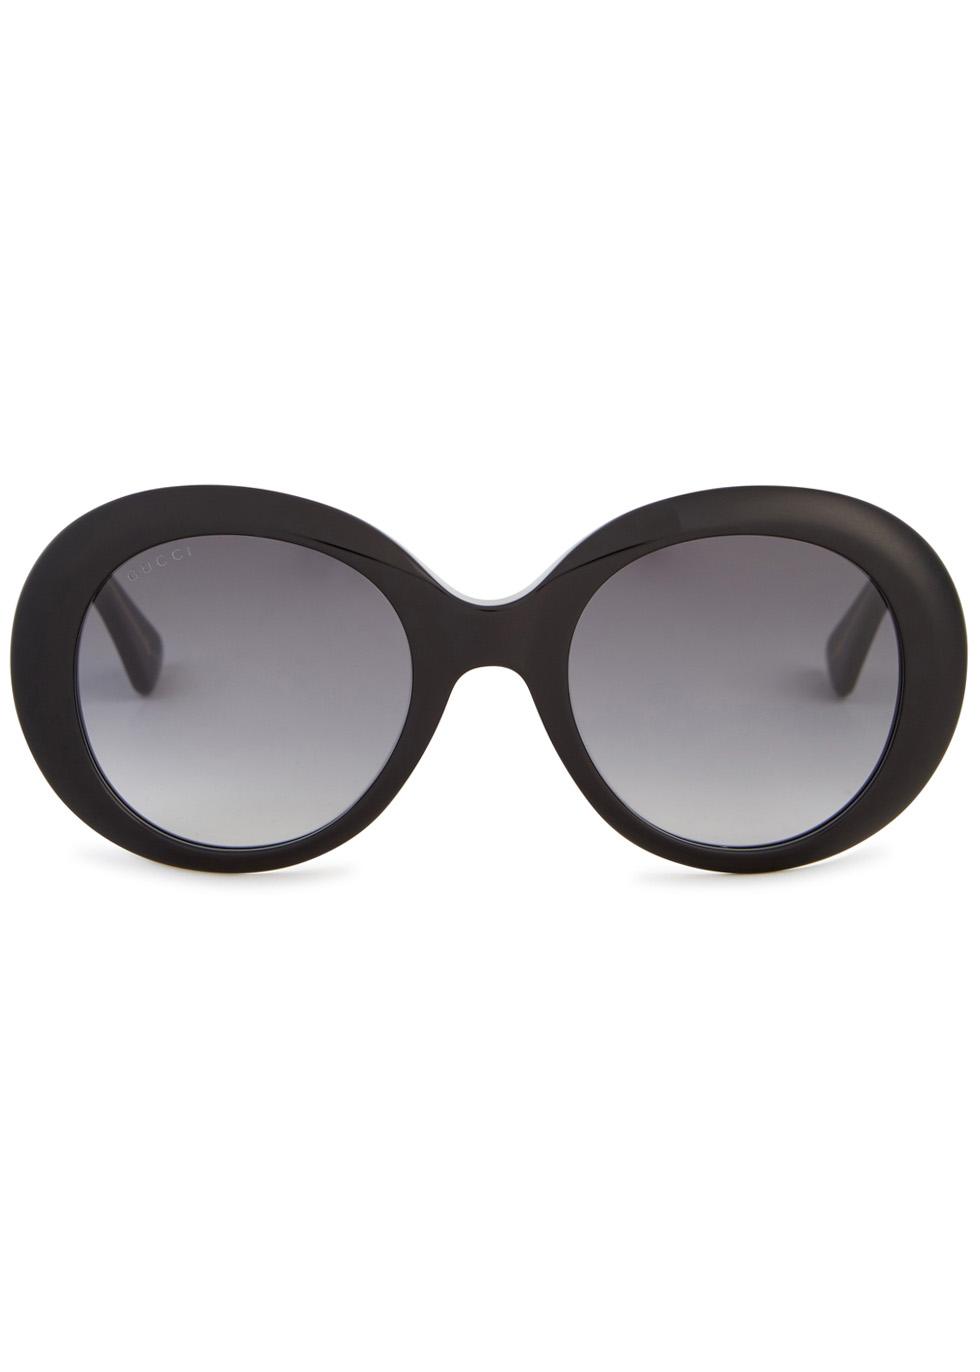 Black round-frame sunglasses - Gucci